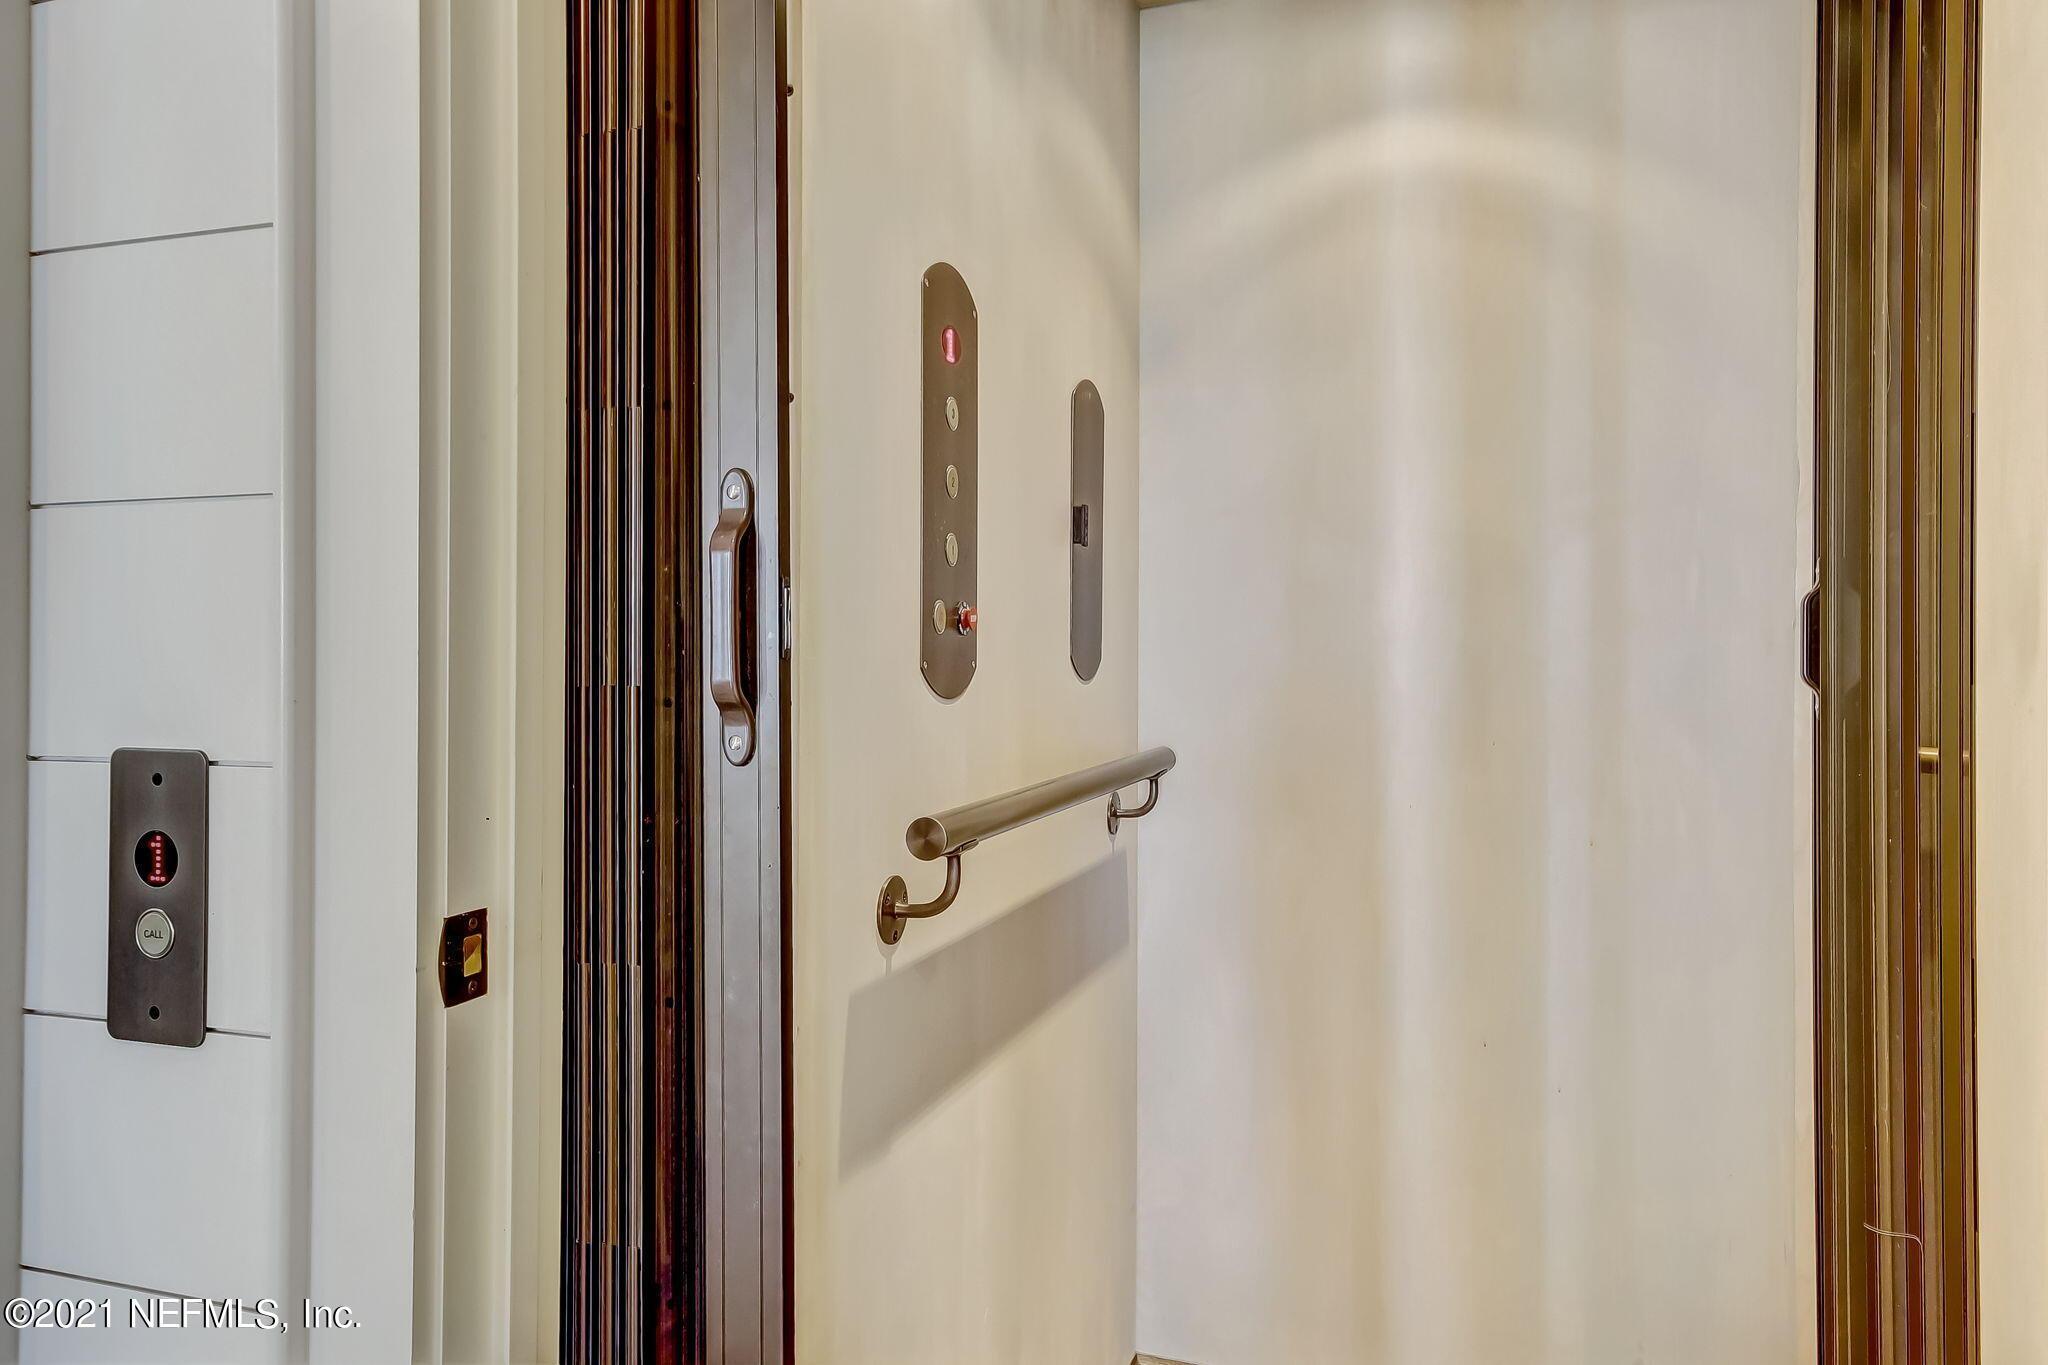 901 PONTE VEDRA, PONTE VEDRA BEACH, FLORIDA 32082, 6 Bedrooms Bedrooms, ,7 BathroomsBathrooms,Residential,For sale,PONTE VEDRA,1111755